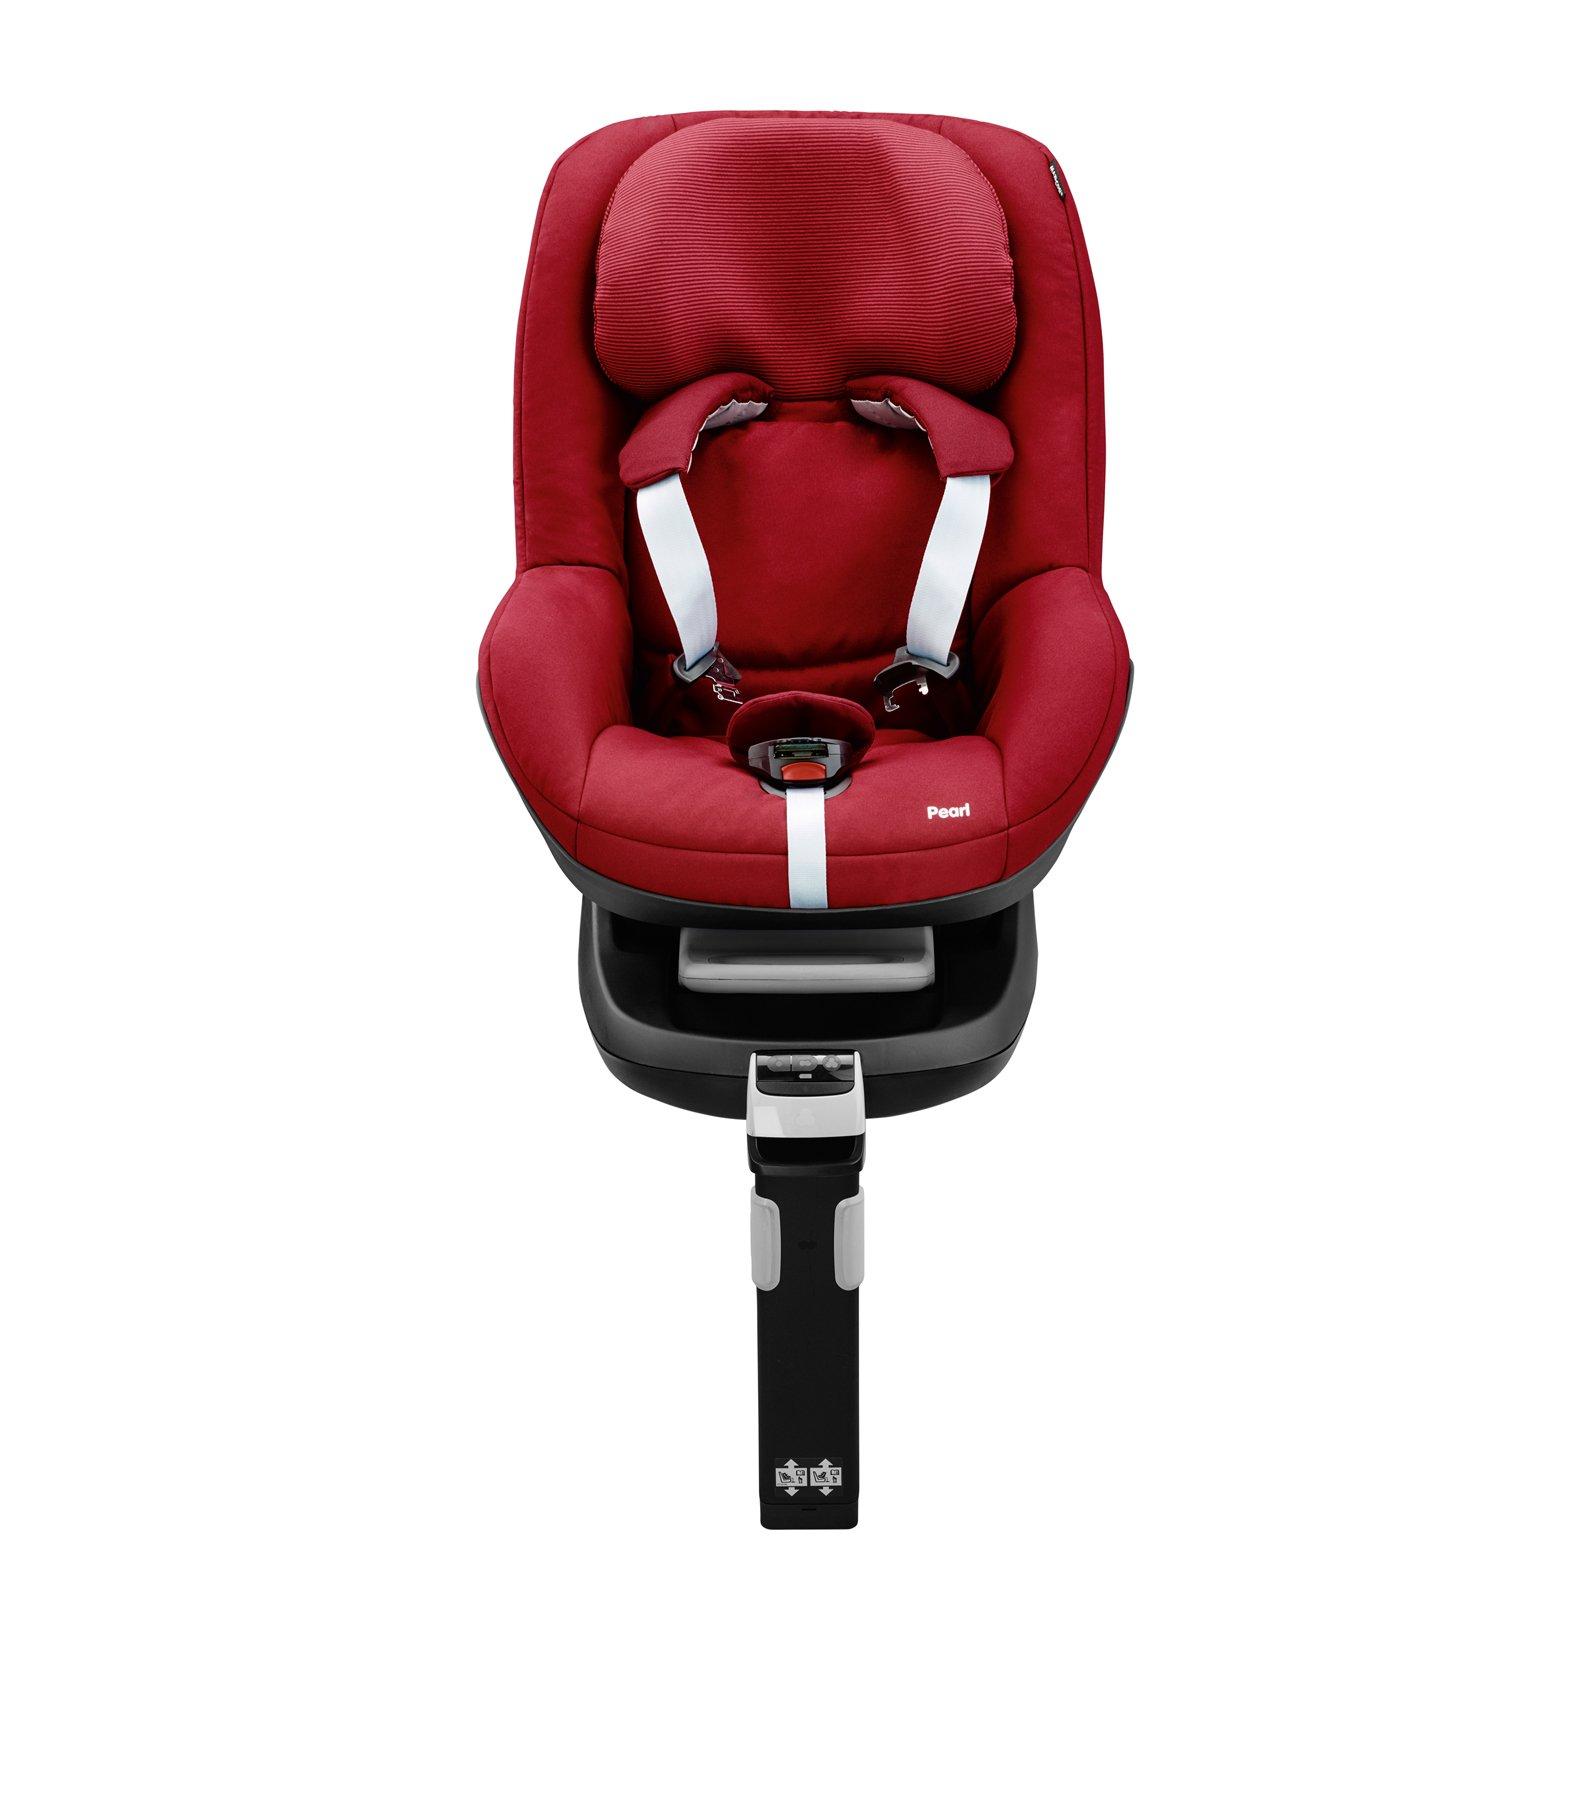 Maxi-Cosi 63409641Pearl Children's Seat, Group 1, 9-18kg Maxi-Cosi  70